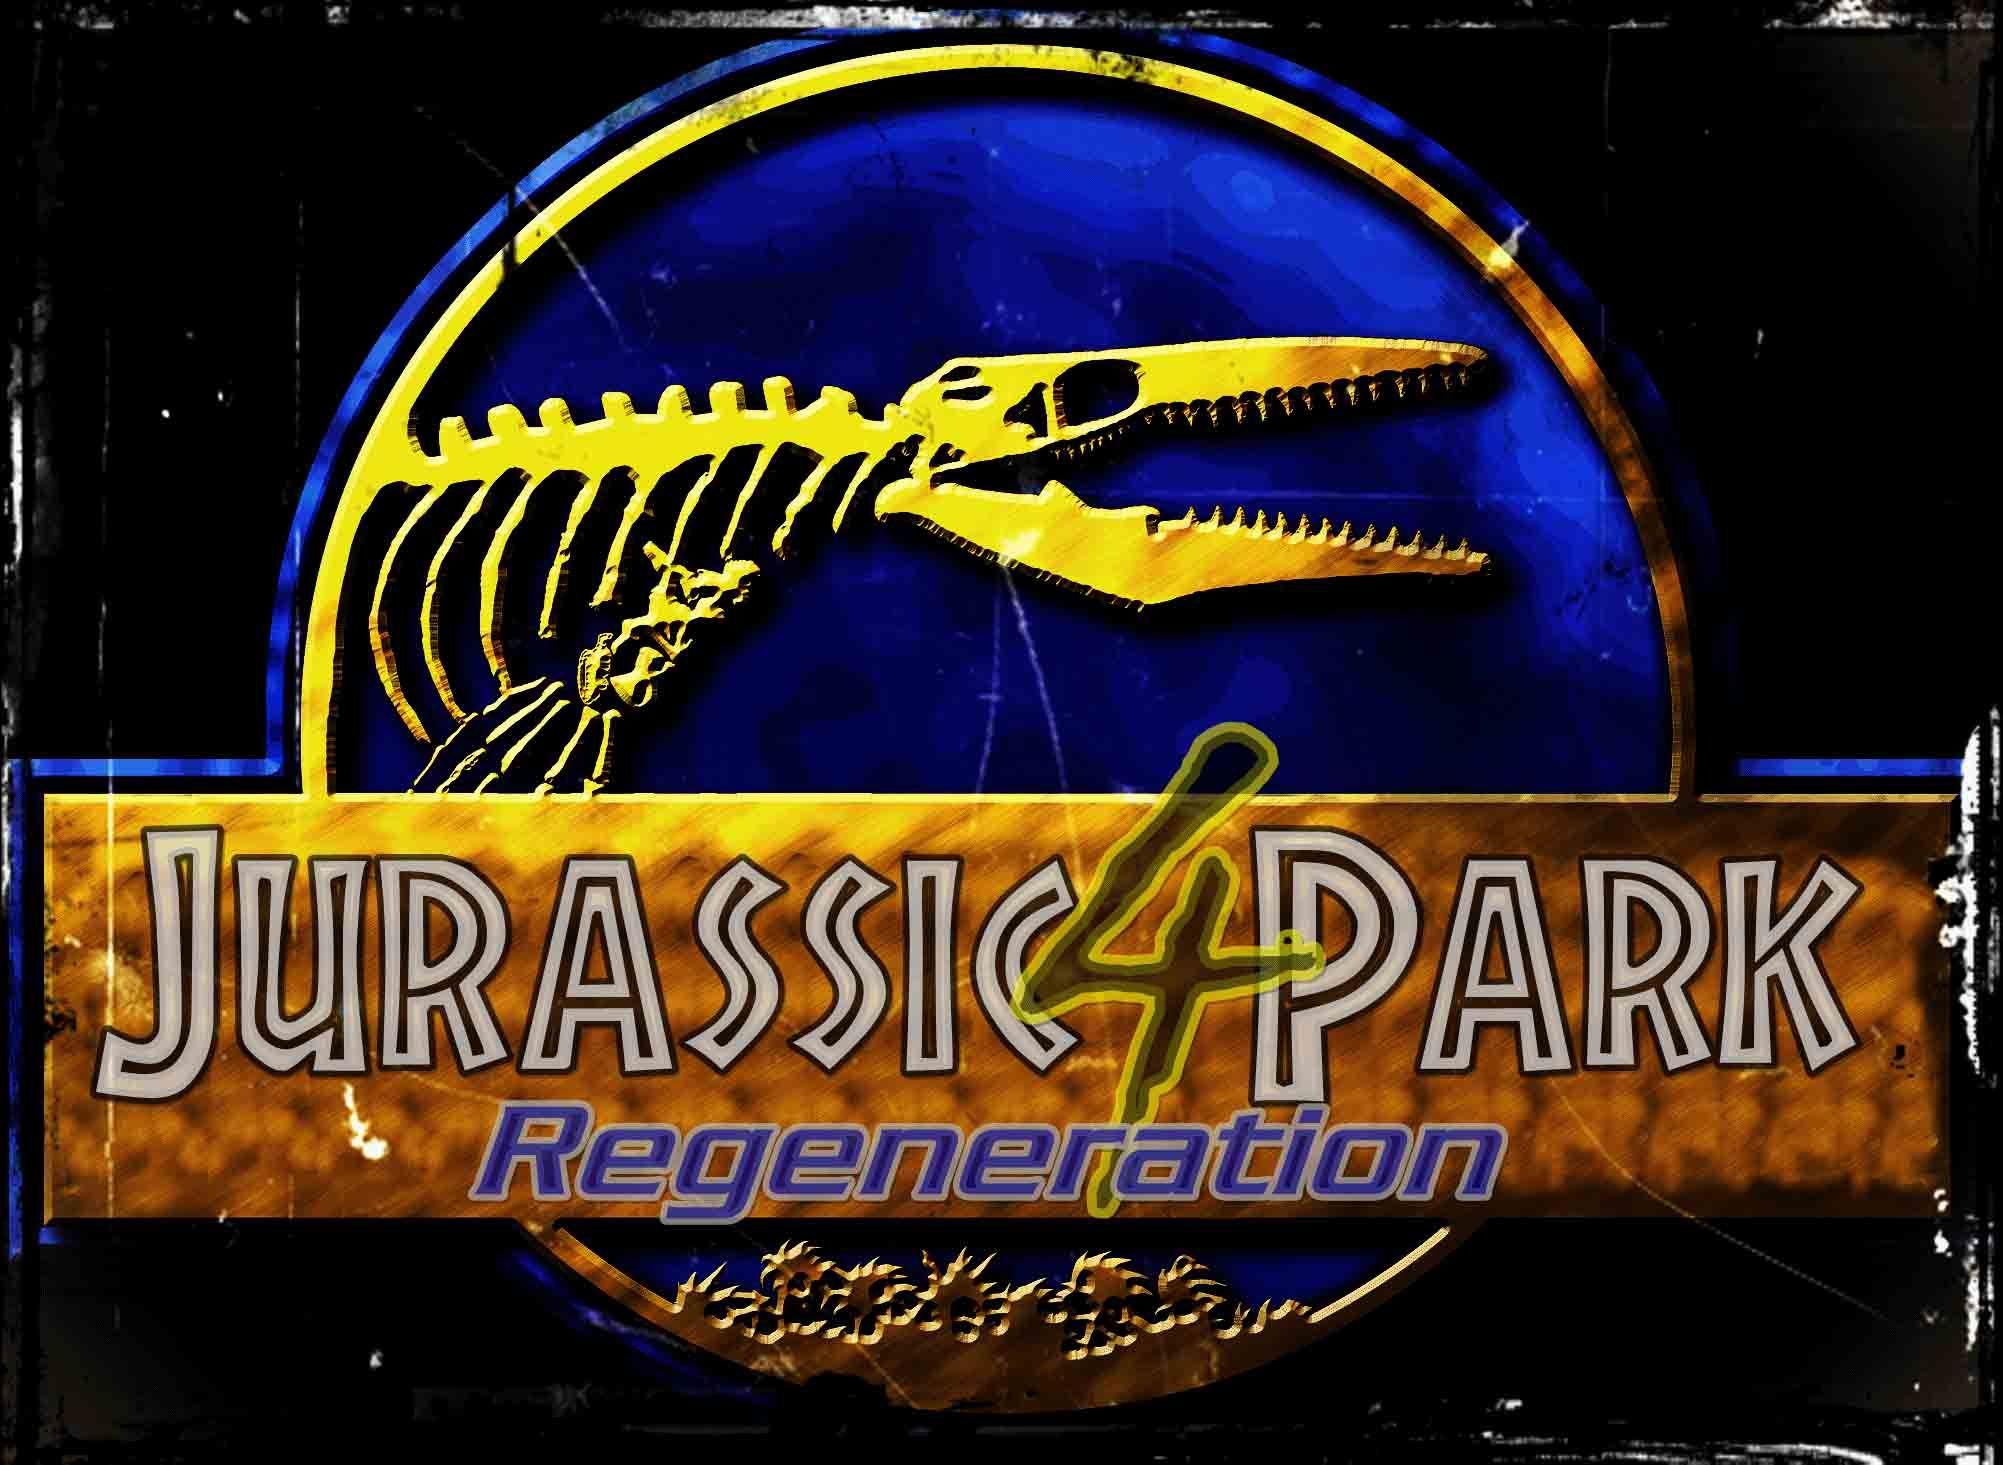 Image Jurassic Park Wallpaper  Jurassic Park